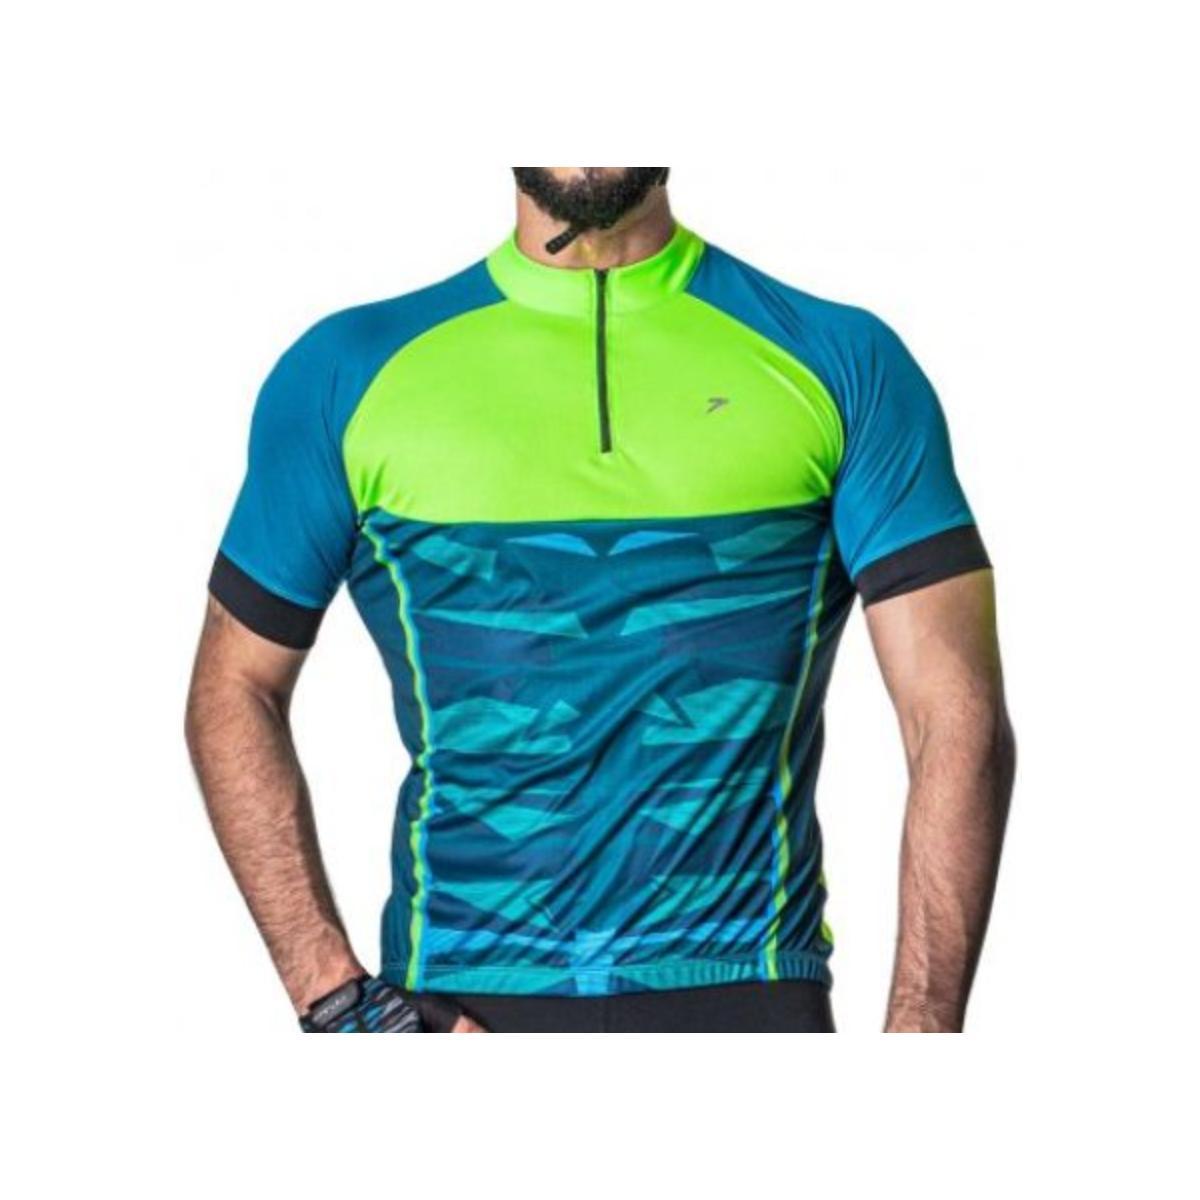 Camisa Masculina Poker 04228 Azul/aqua/verde